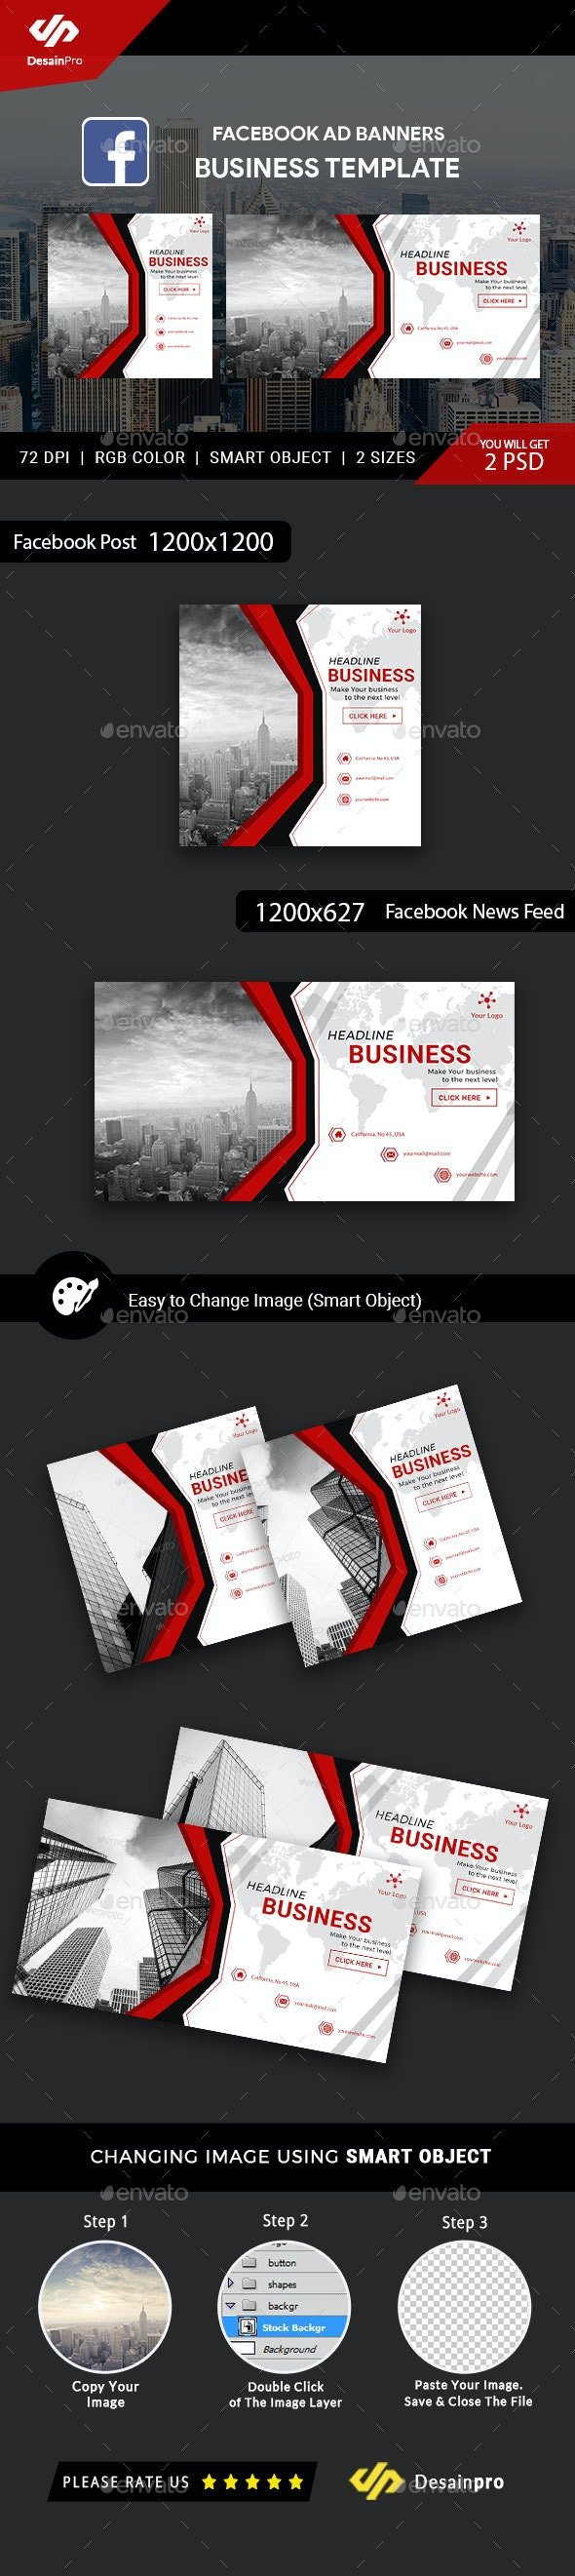 Business Service Facebook Ads Banner - AR by DesainPro